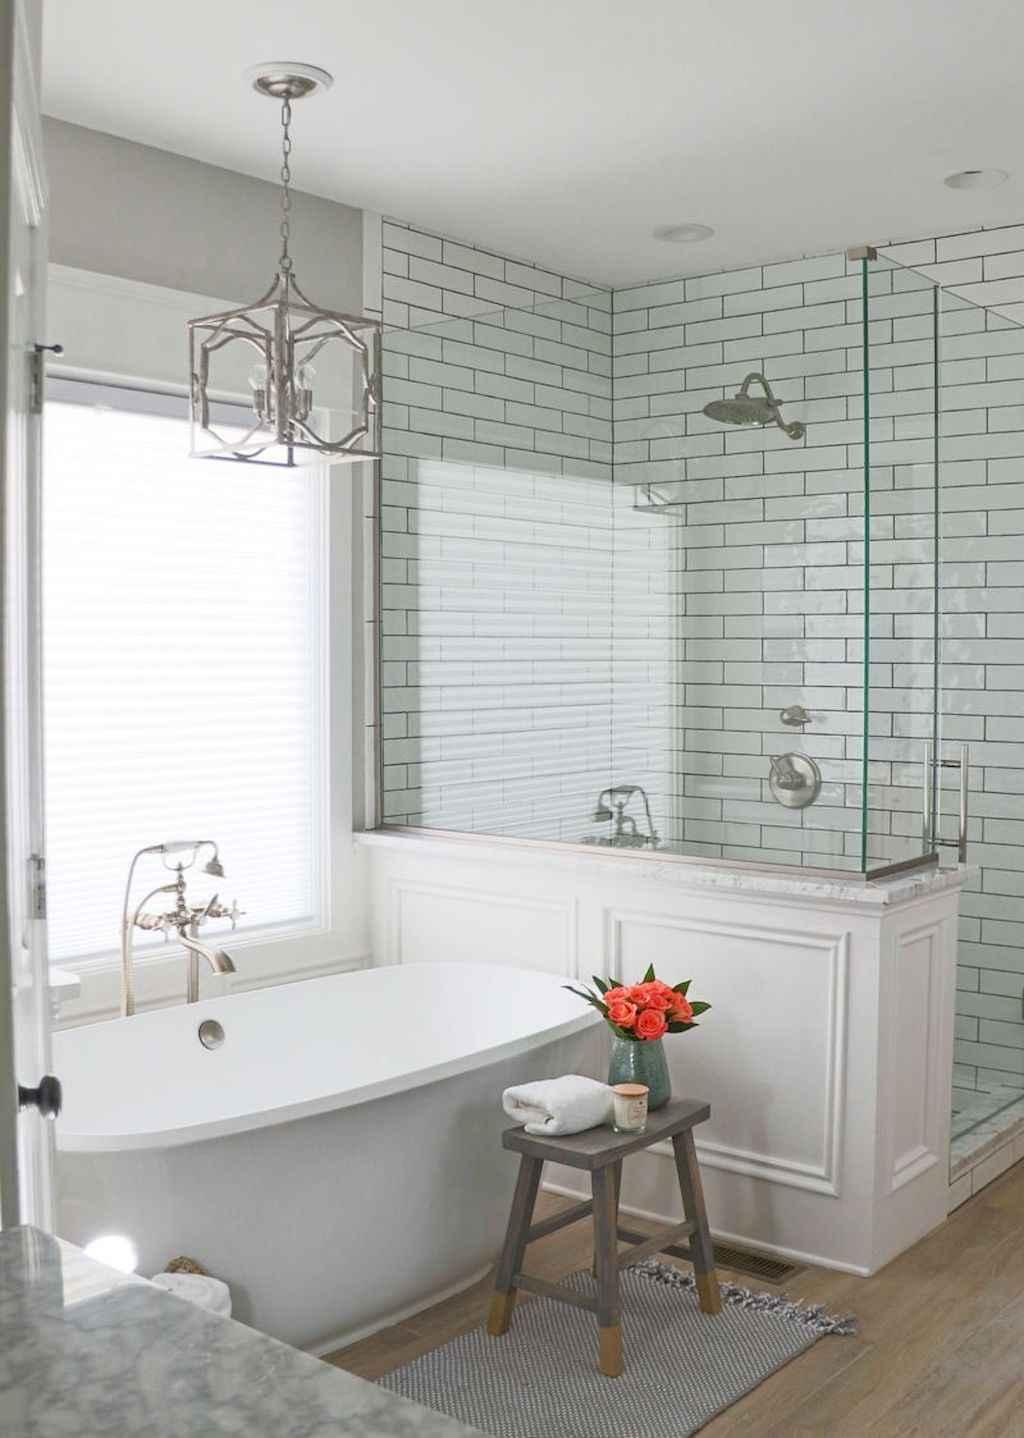 Rustic farmhouse master bathroom remodel ideas (61) - HomeSpecially